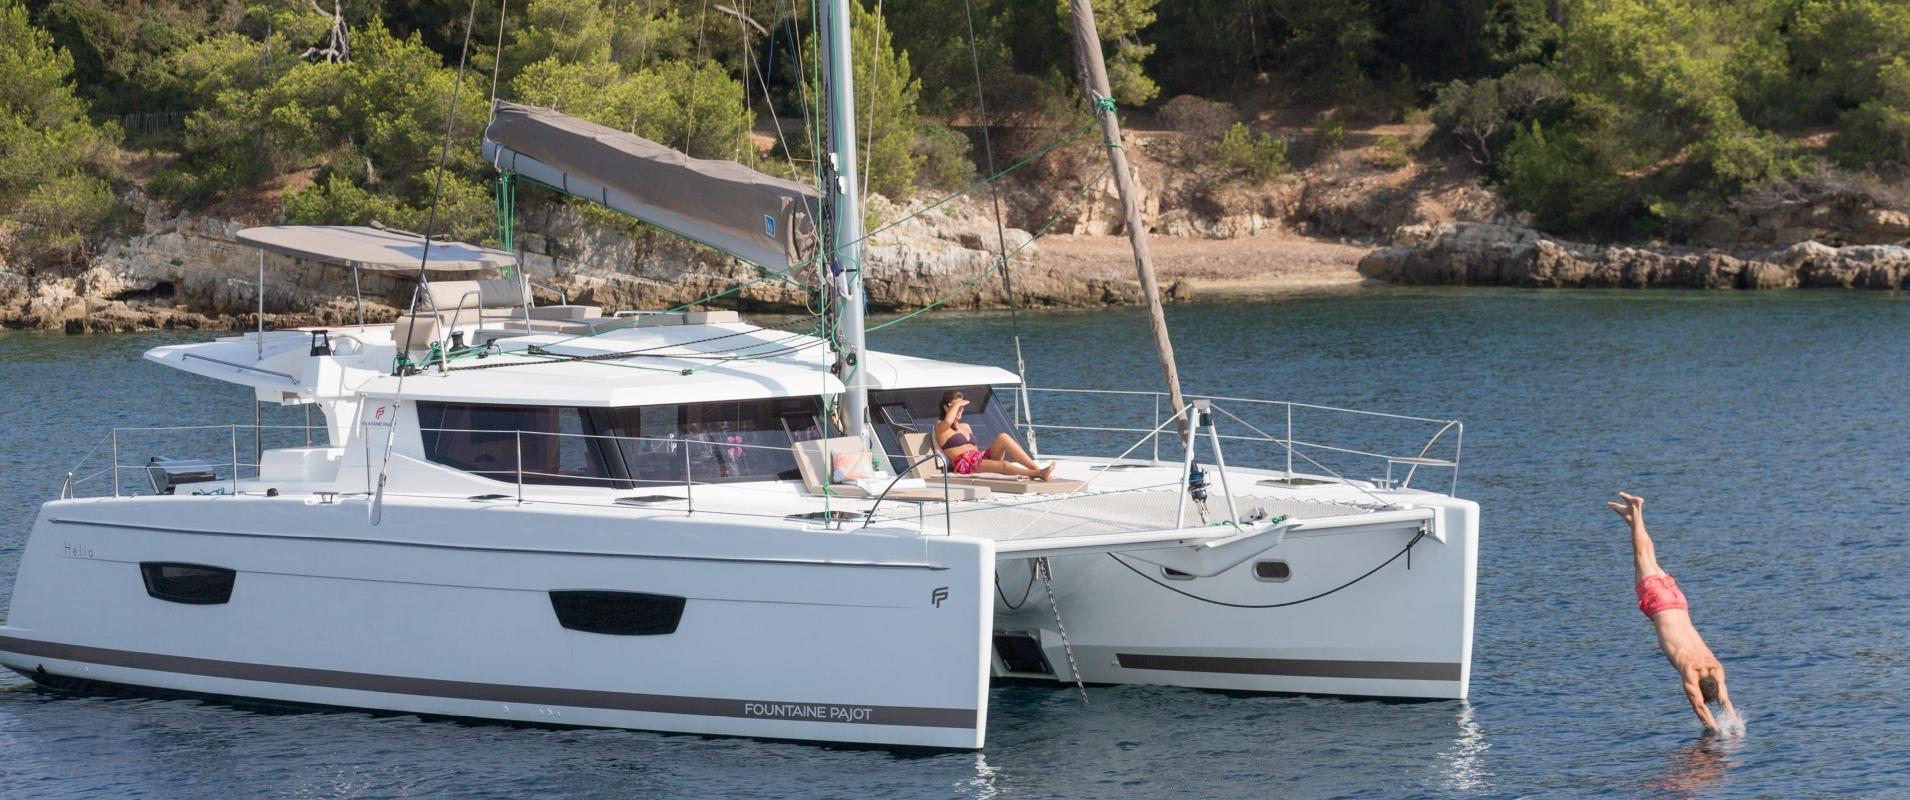 cruising catamarans helia 44 evolution fountaine pajot. Black Bedroom Furniture Sets. Home Design Ideas